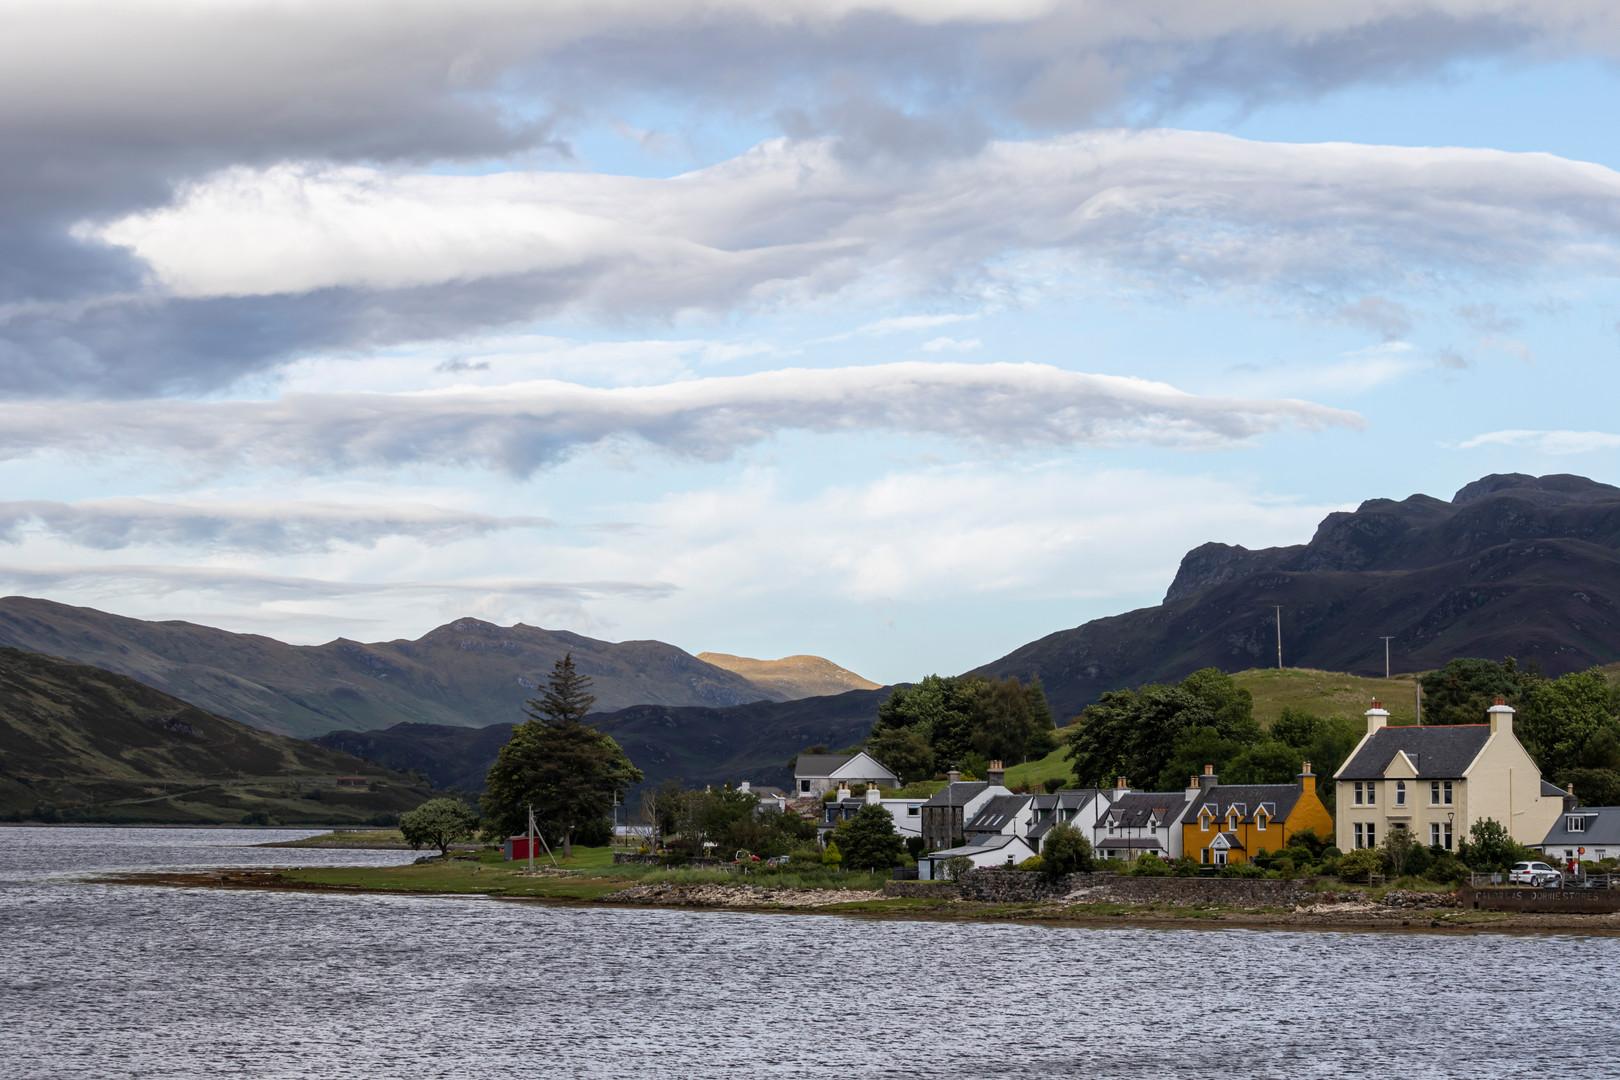 View of Dornie, Scotland from the A87 Bridge